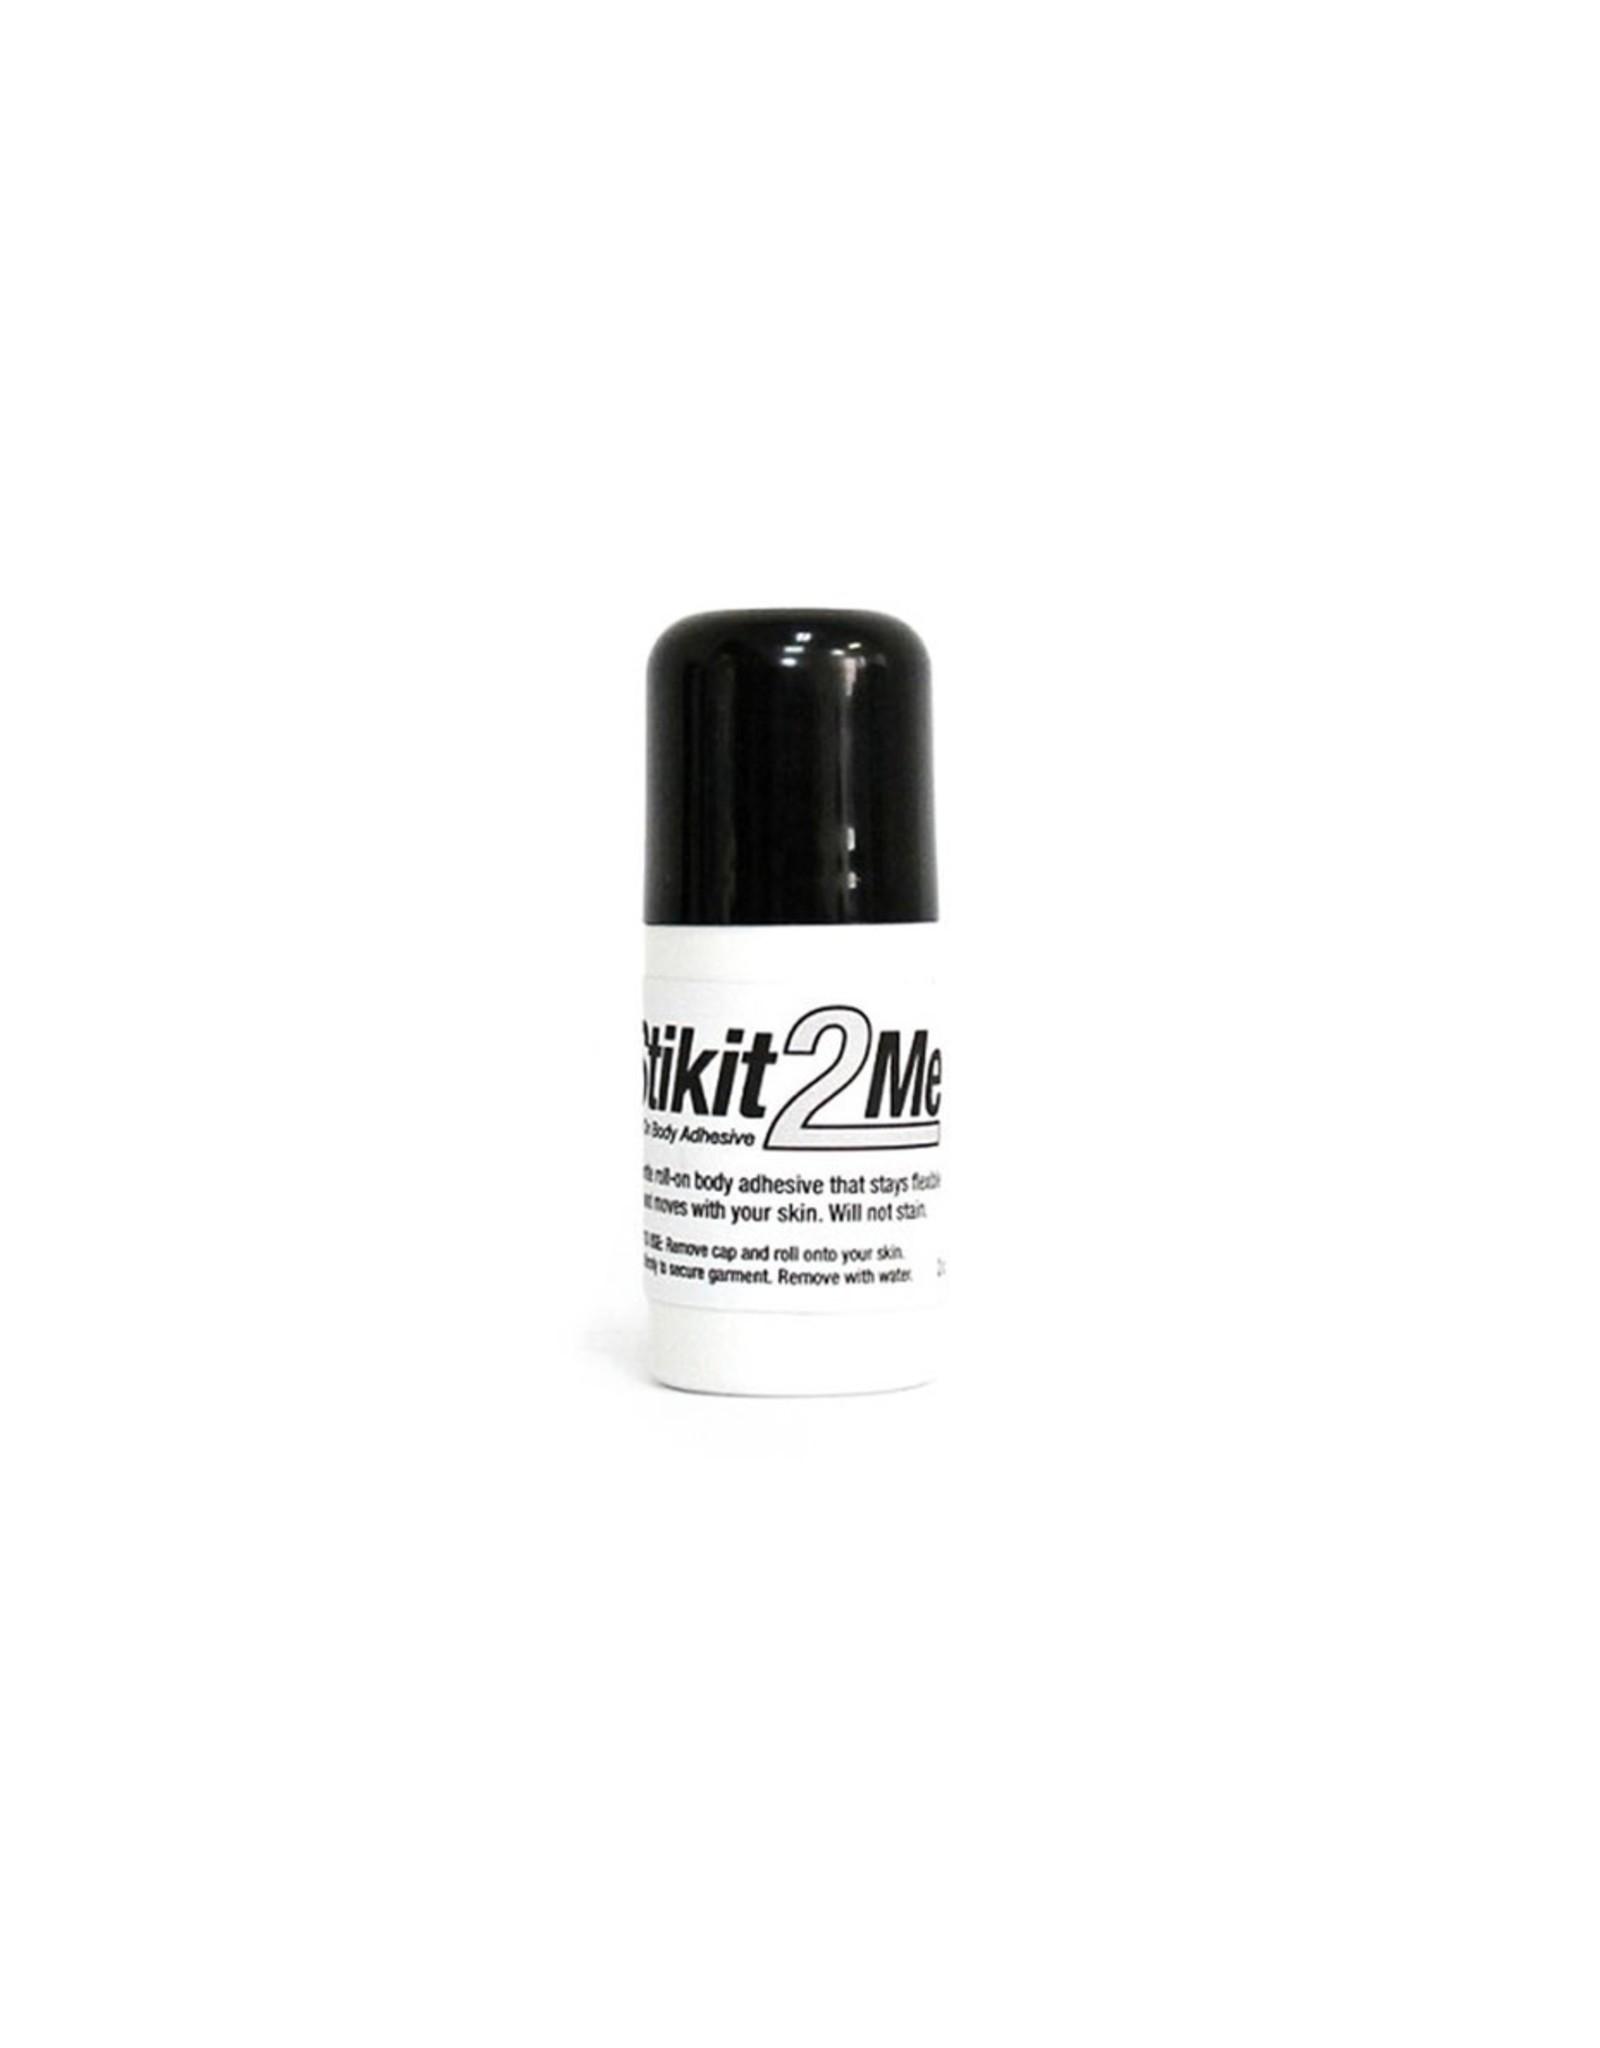 PILLOWS FOR POINTES RBG Stikit 2 Me Roll On Body Glue Large 2oz